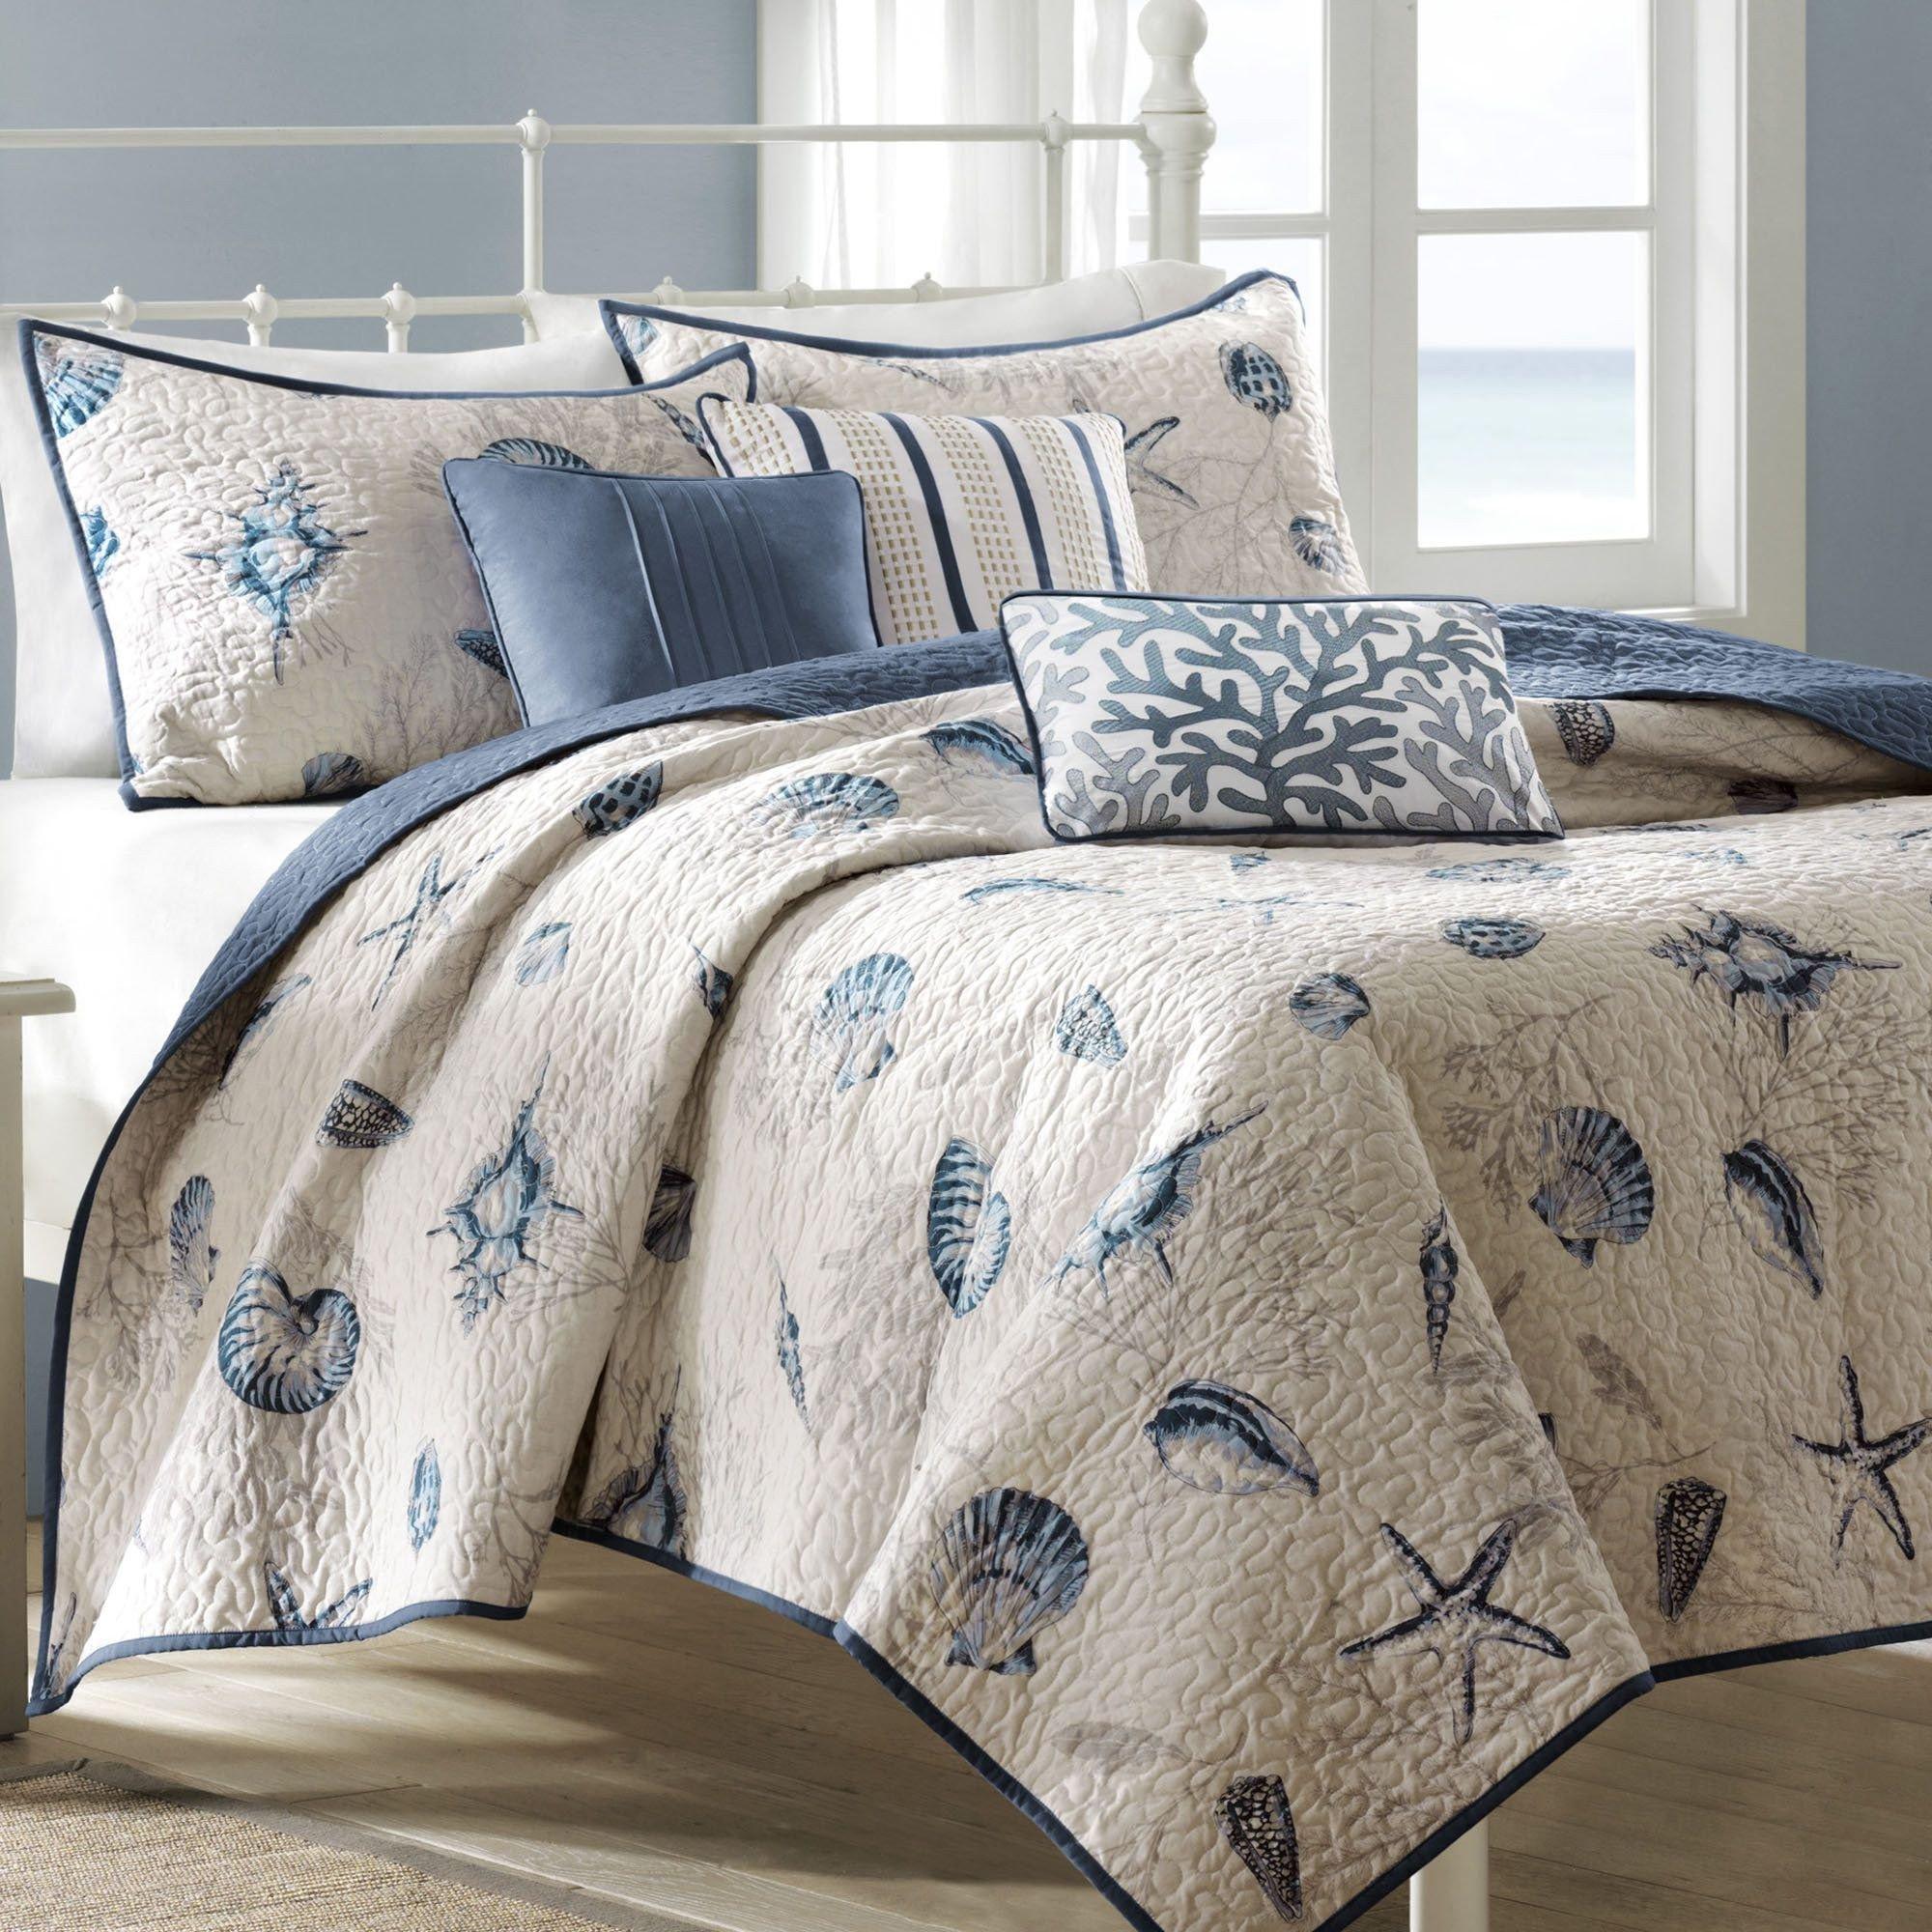 Beach themed Bedroom Set Inspirational Nantucket Coastal Seashell 6 Pc Coverlet Bed Set